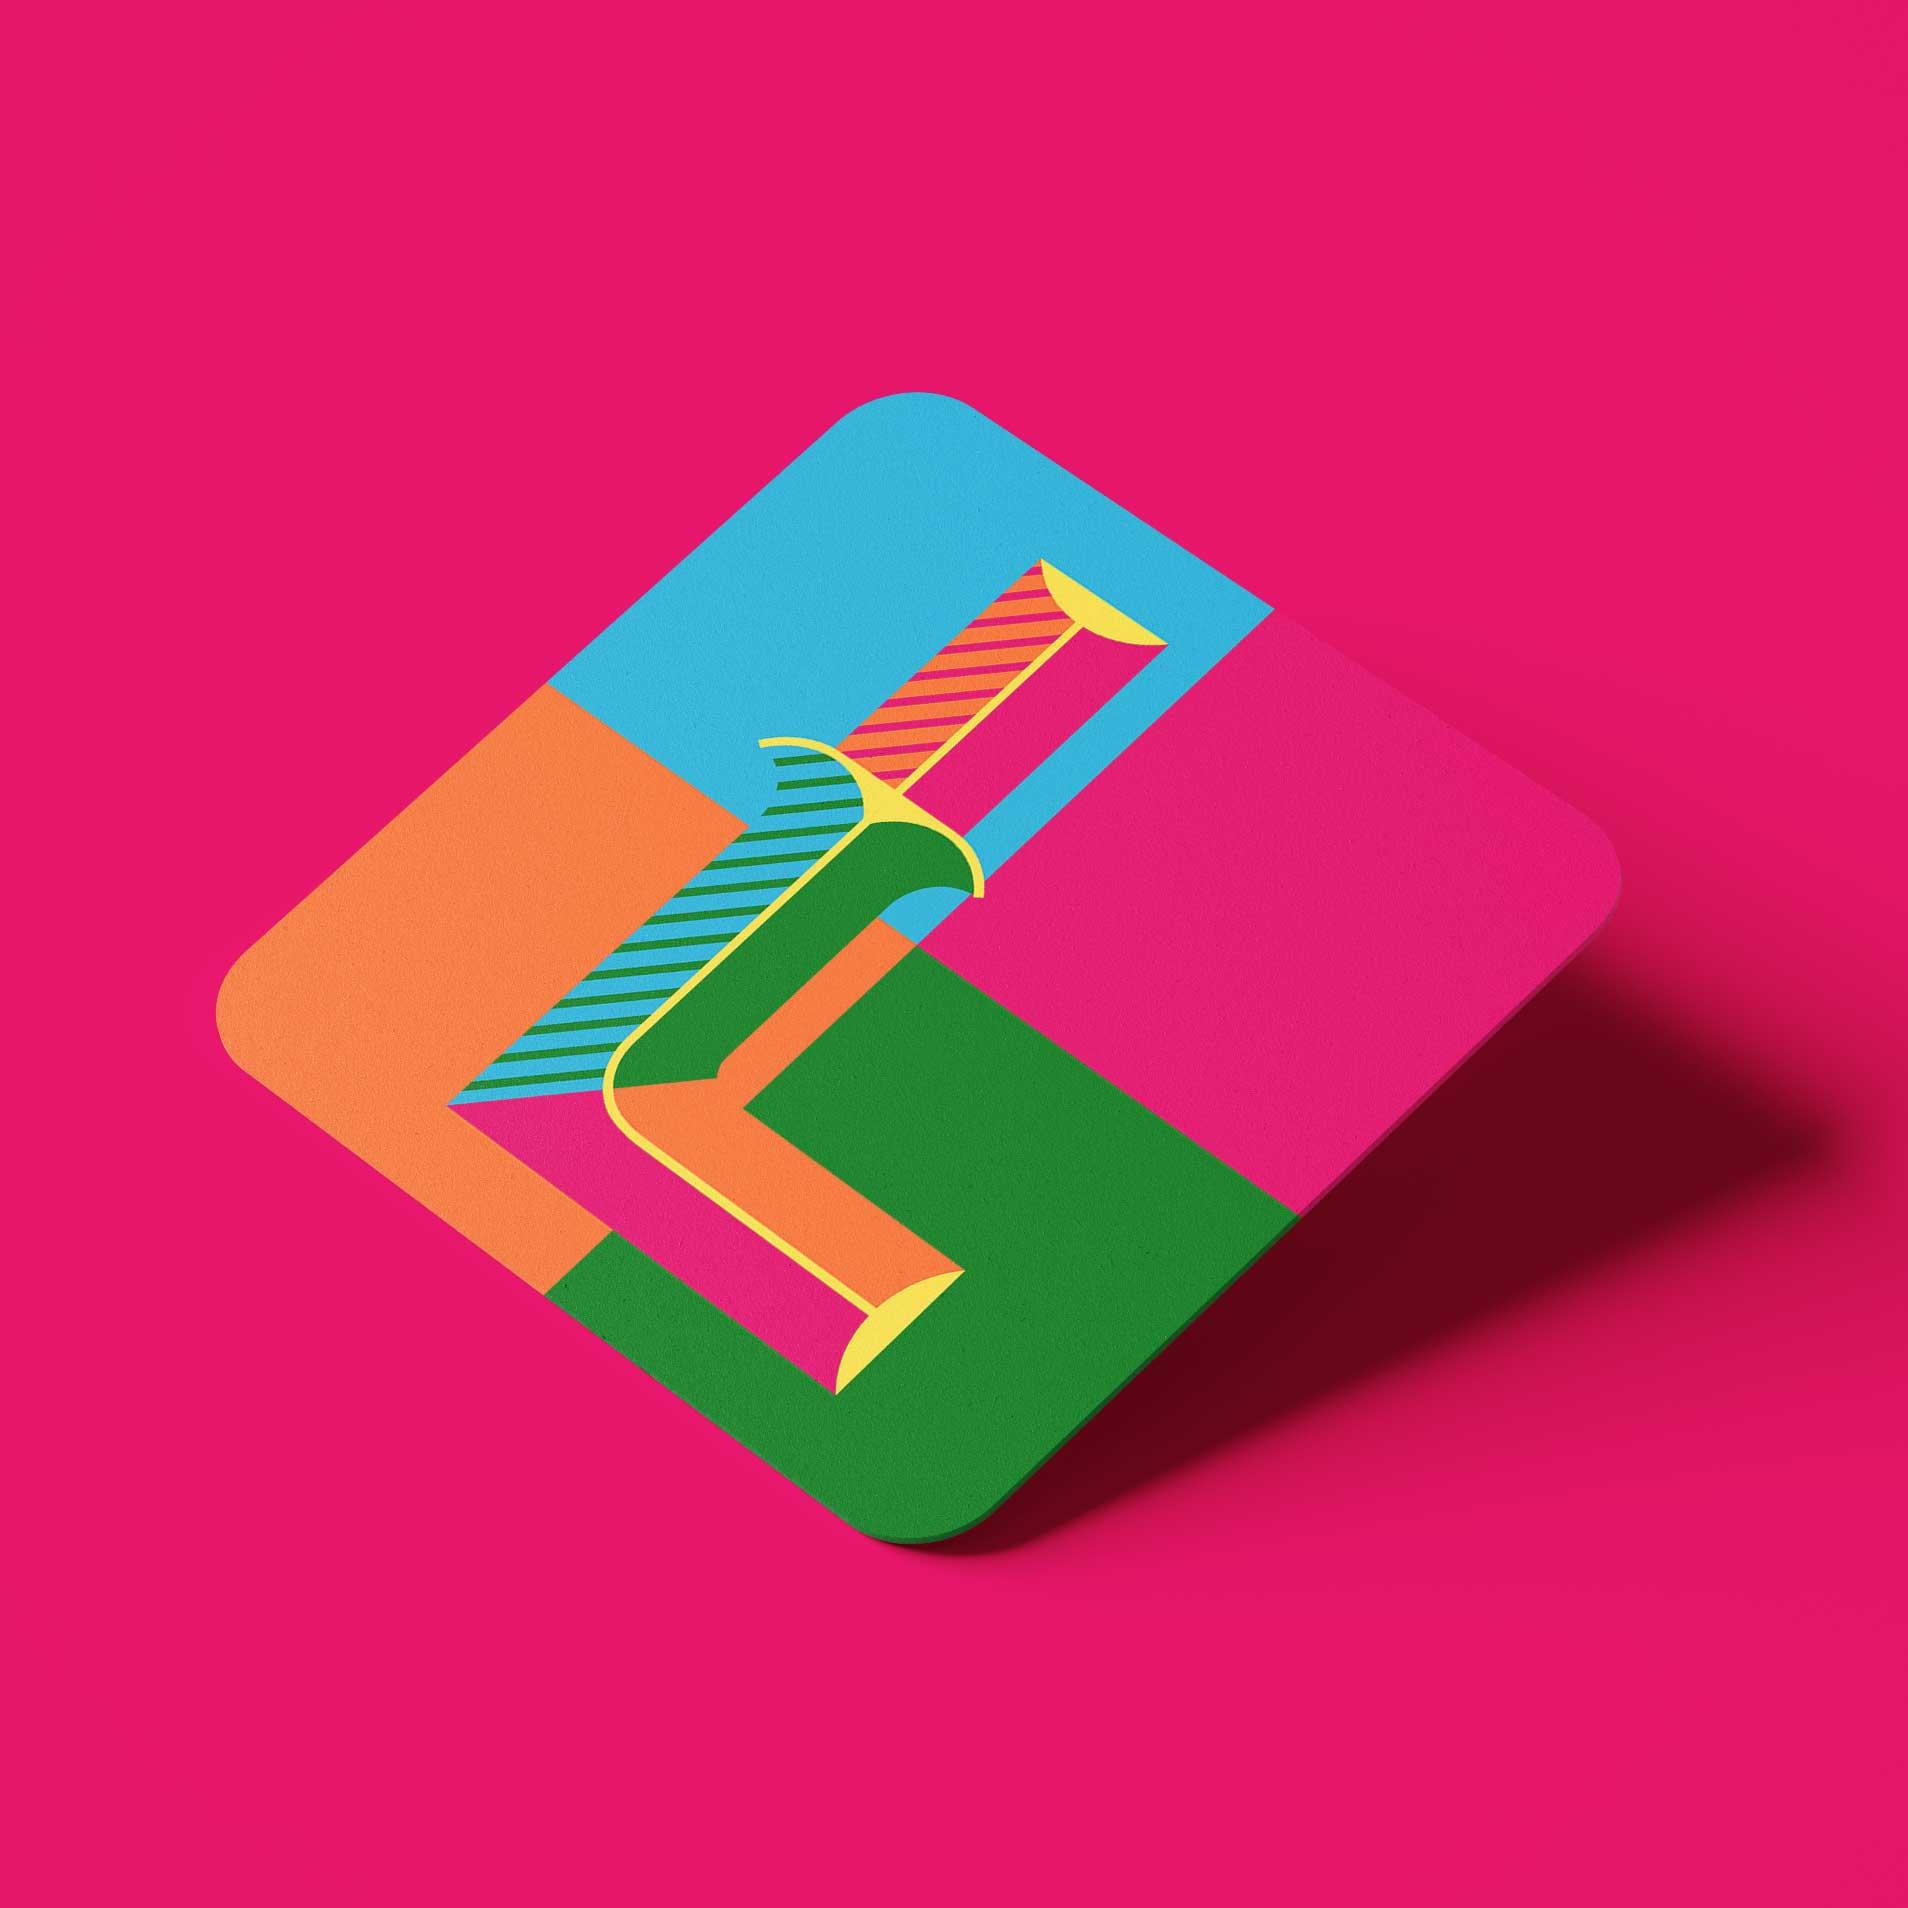 LOVE Personalized Coasters Set (Letter L)